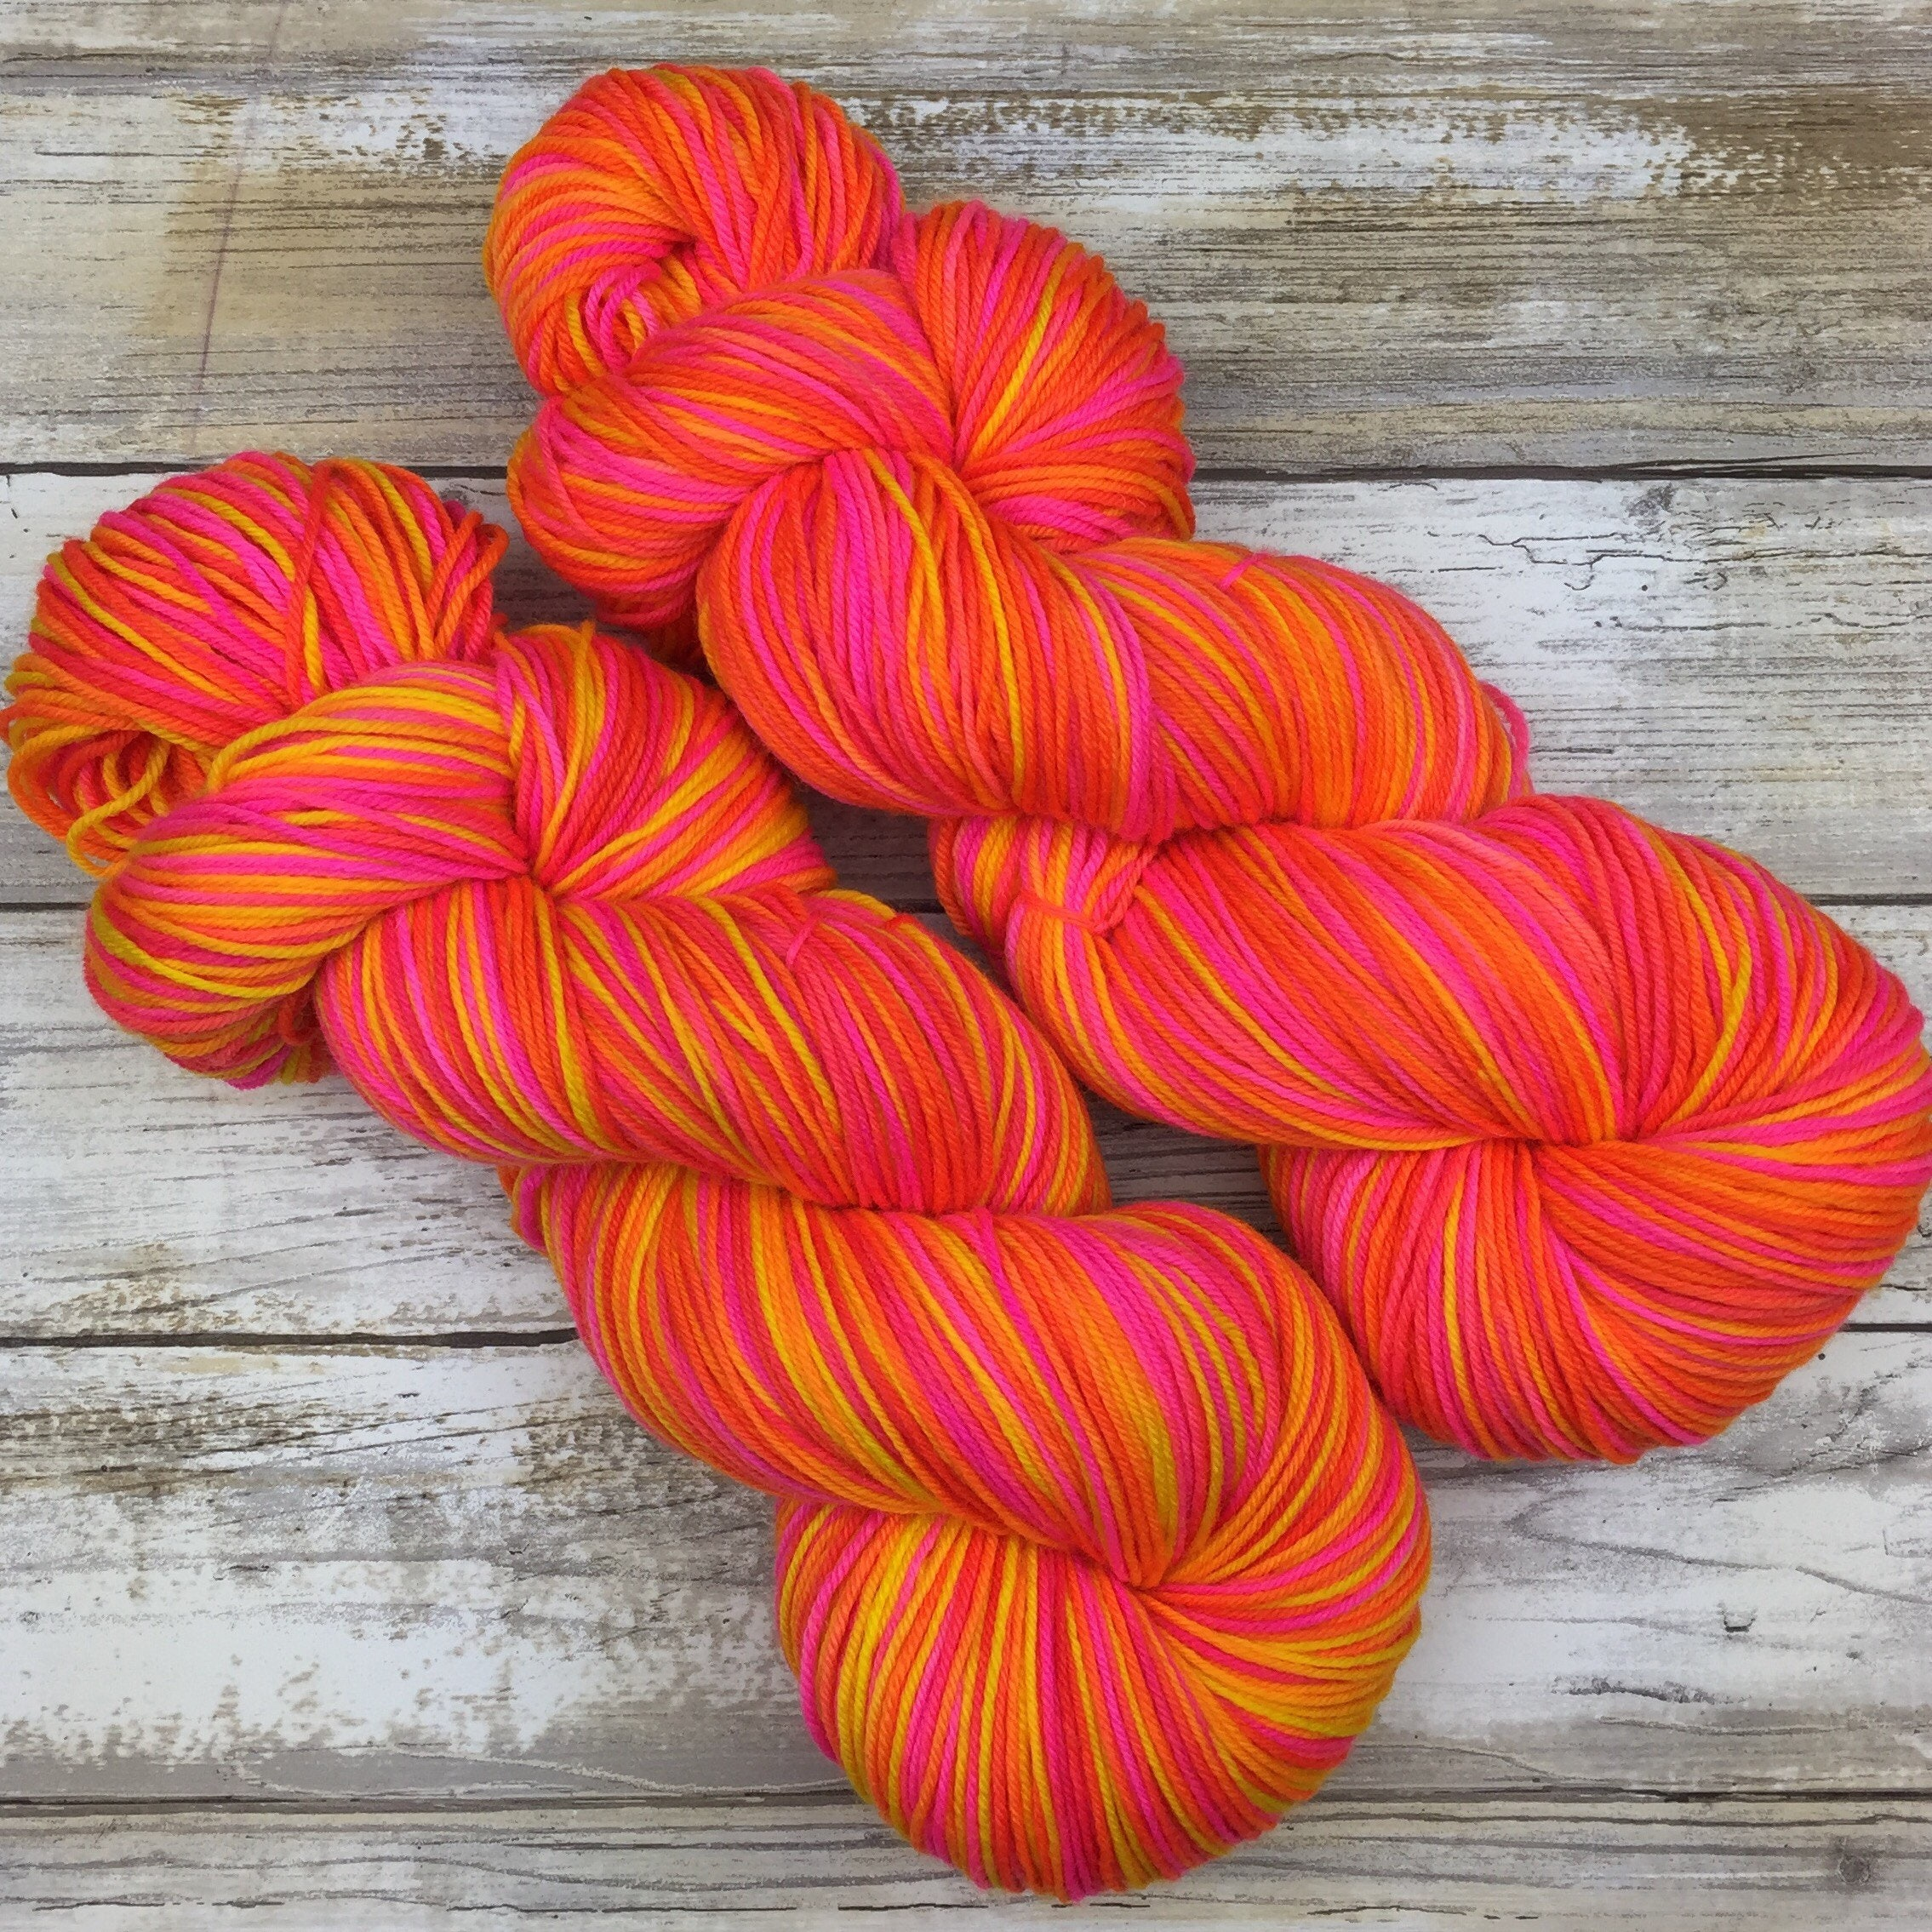 100g Sock Yarn Peach Coral Hand dyed Yarn  Handdyed yarn SW Merino  Nylon or Merino Cashmere Nylon Fingering Weight Wool Yarn